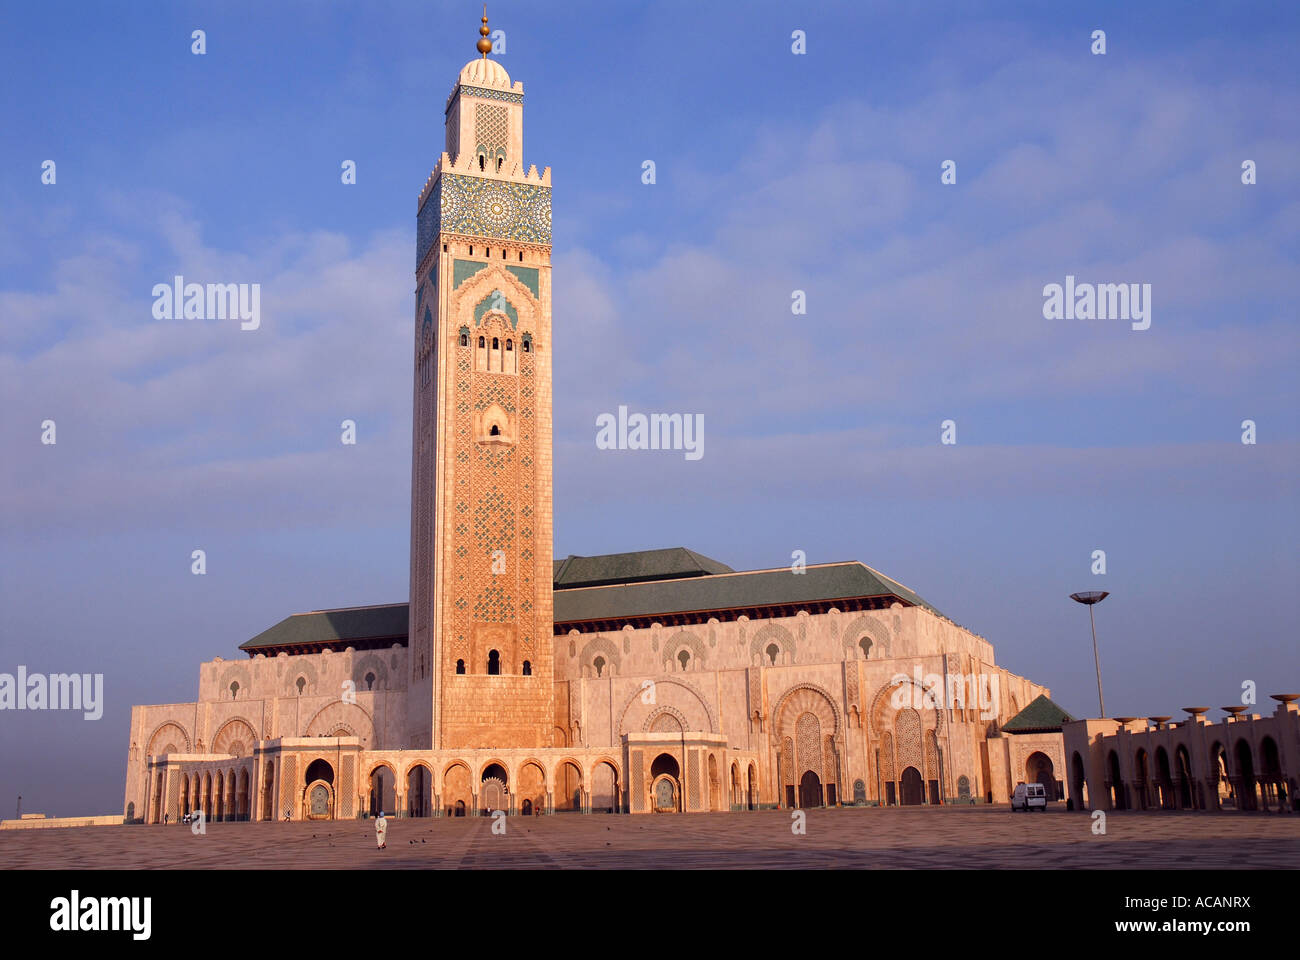 Hassan II Mosque, Casablanca, Morocco, Africa Stock Photo